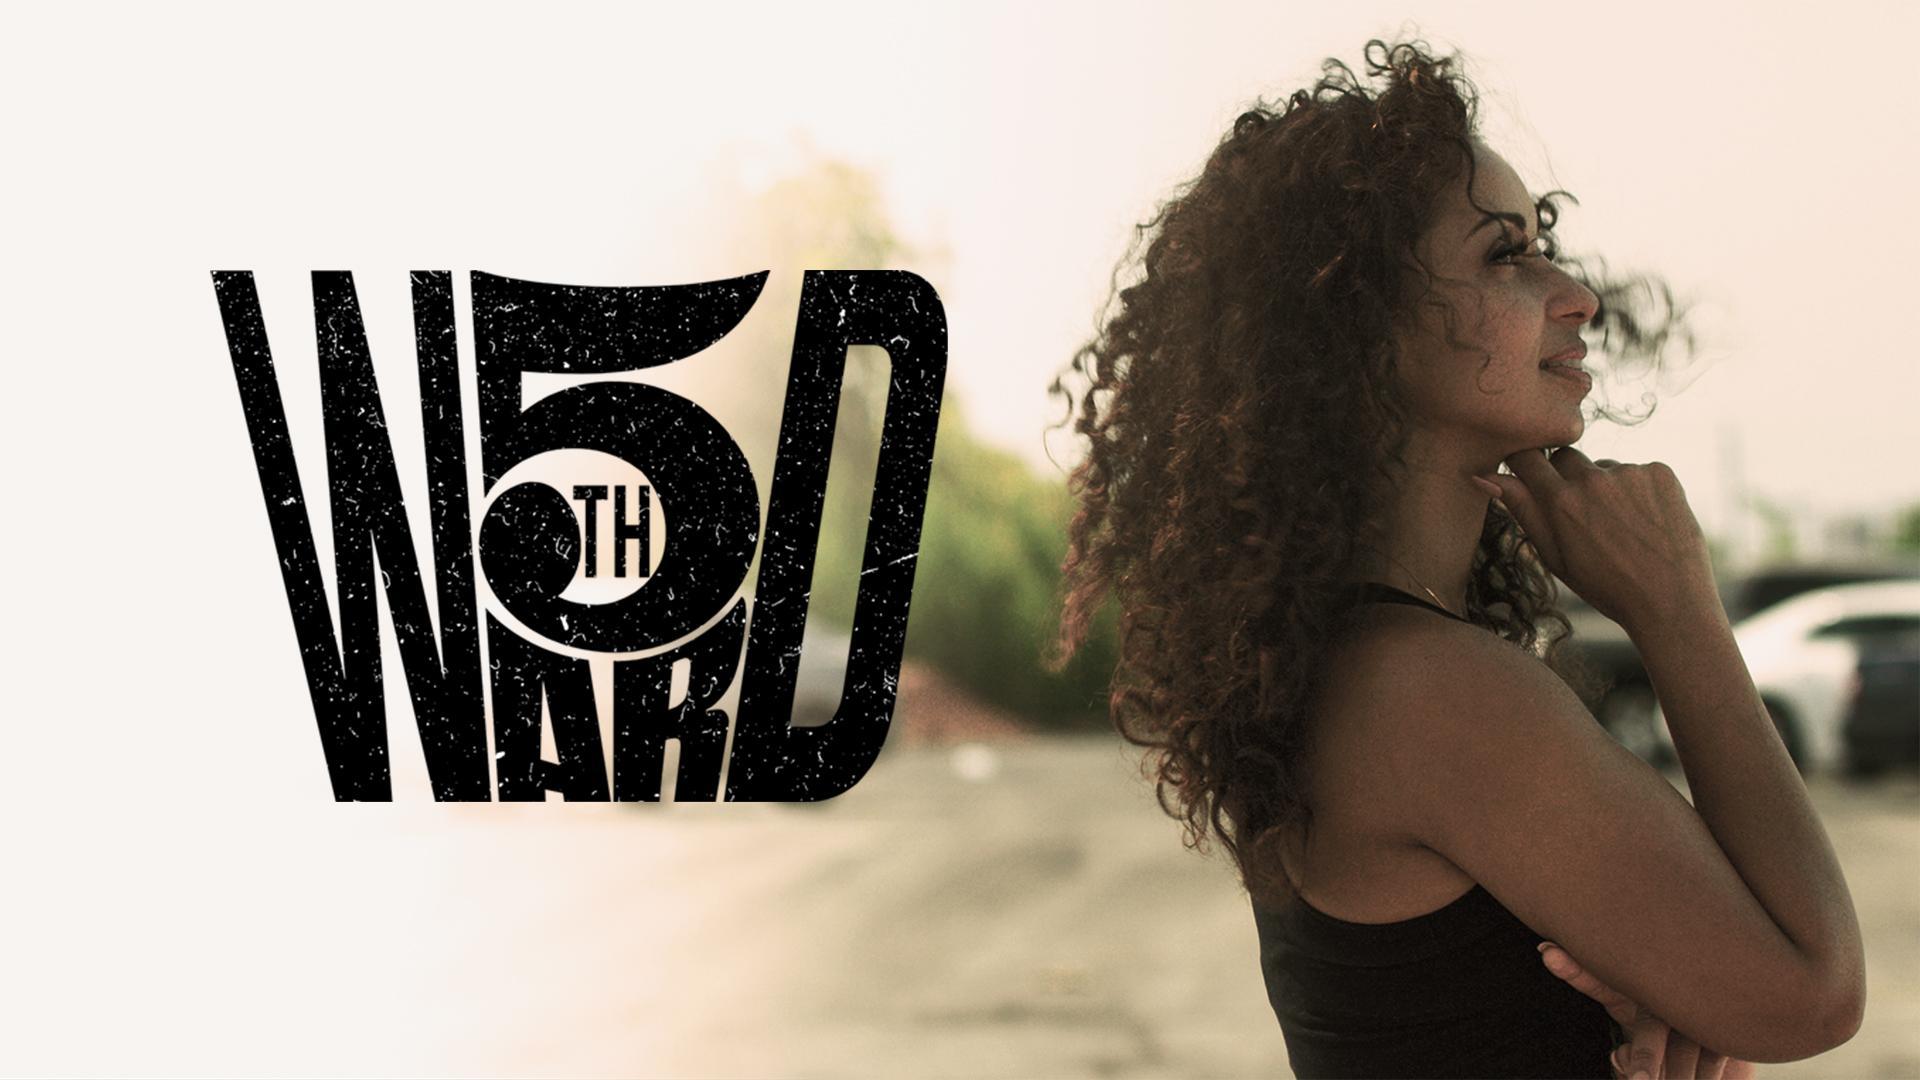 fifthward